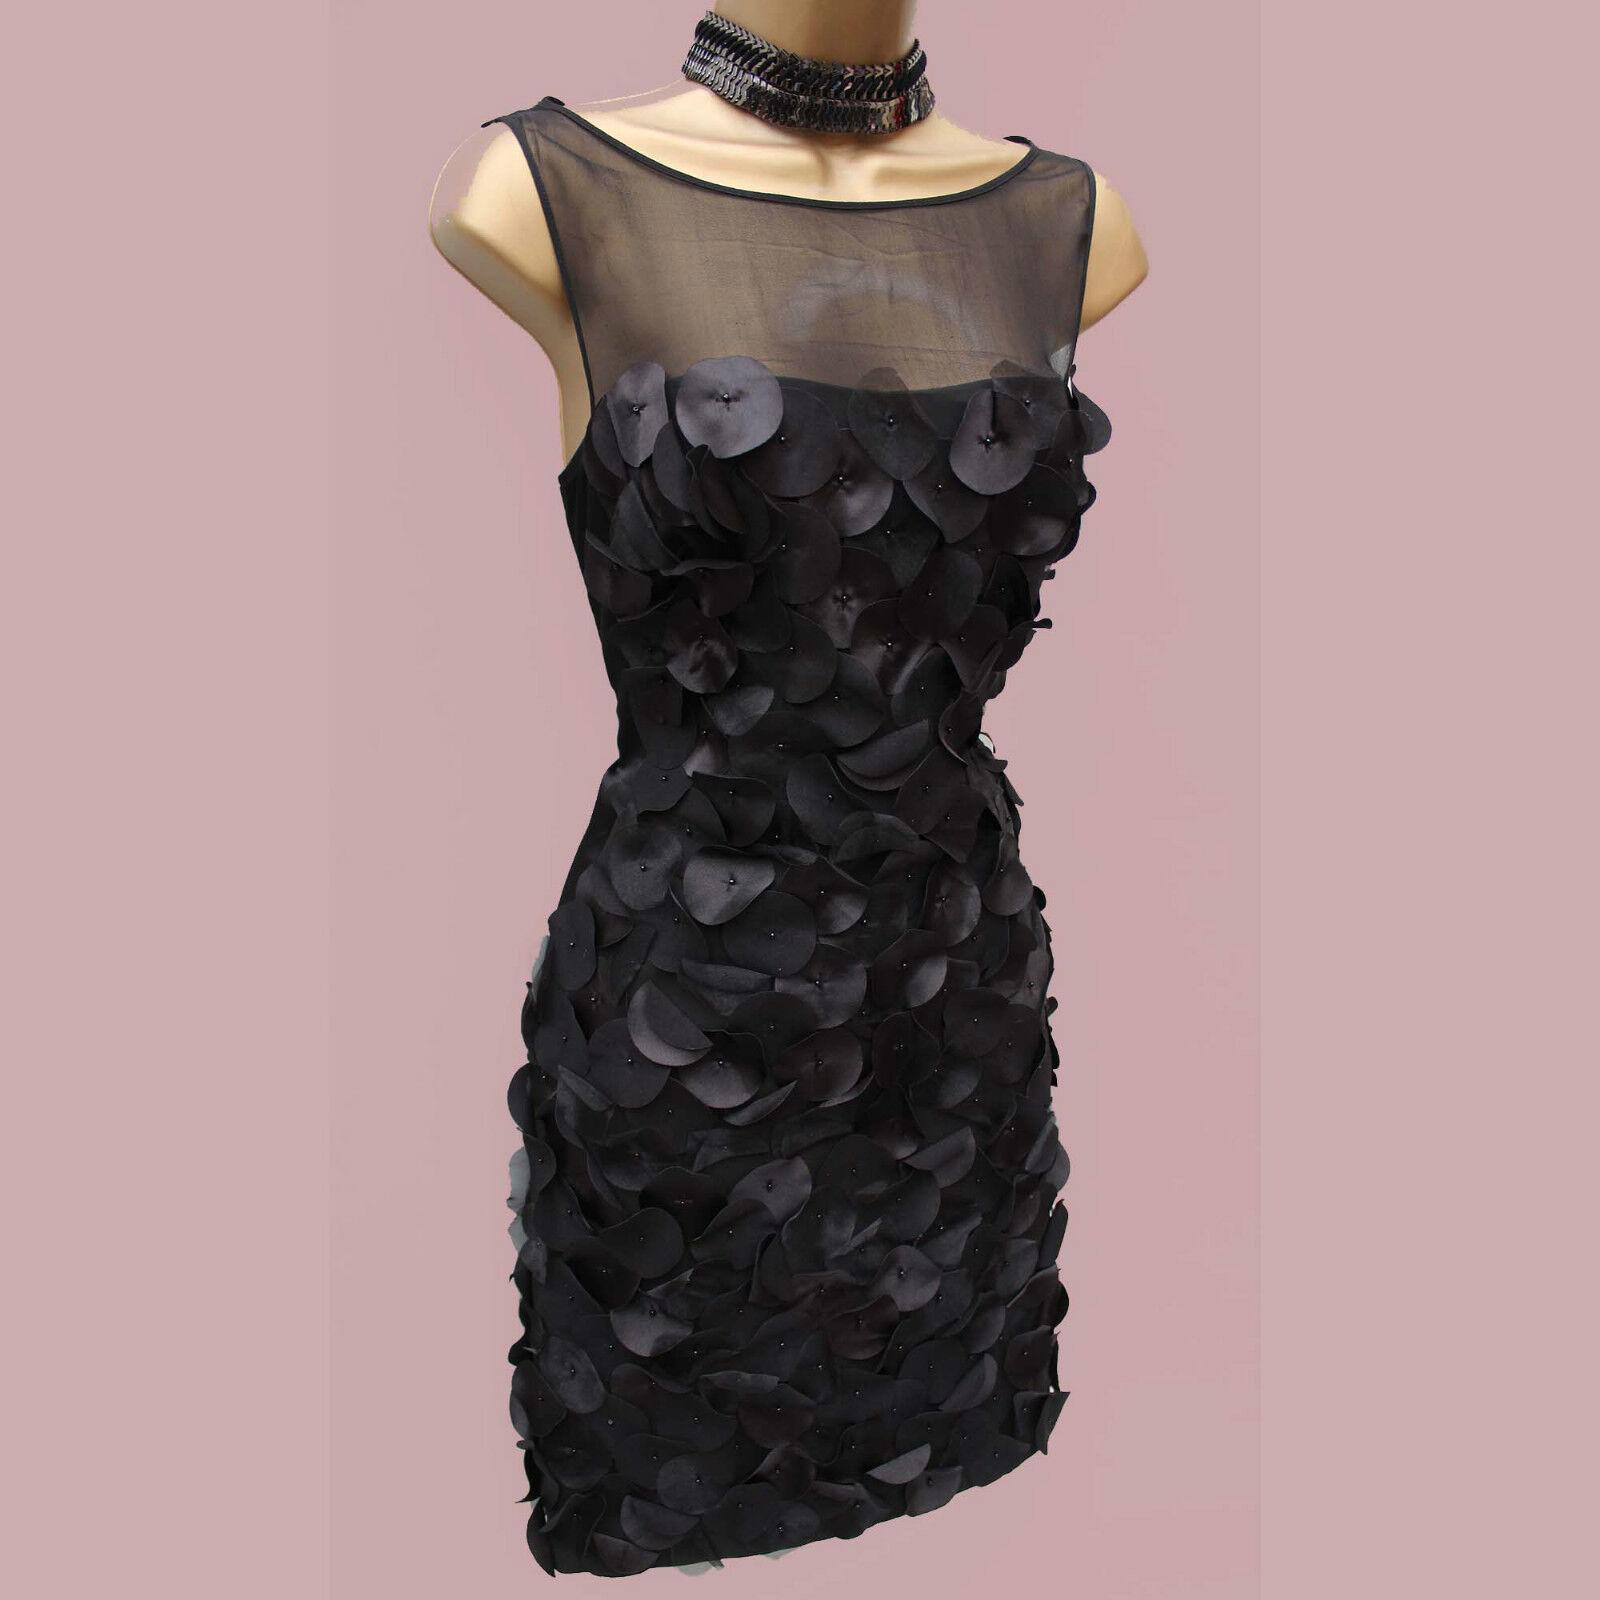 Exquisite KAREN MILLEN  schwarz Silk 3D Flowers Cocktail Wiggle Pencil Dress SZ 10